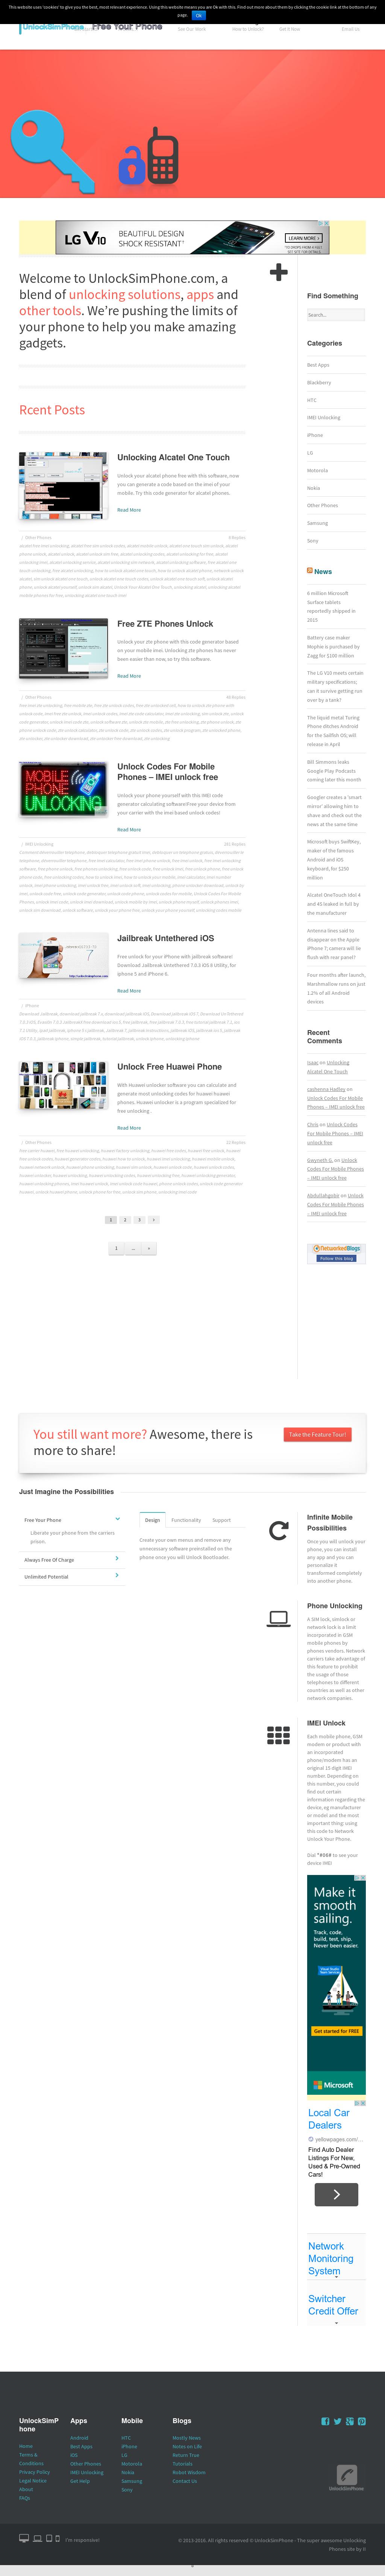 Unlocksimphone Competitors, Revenue and Employees - Owler Company